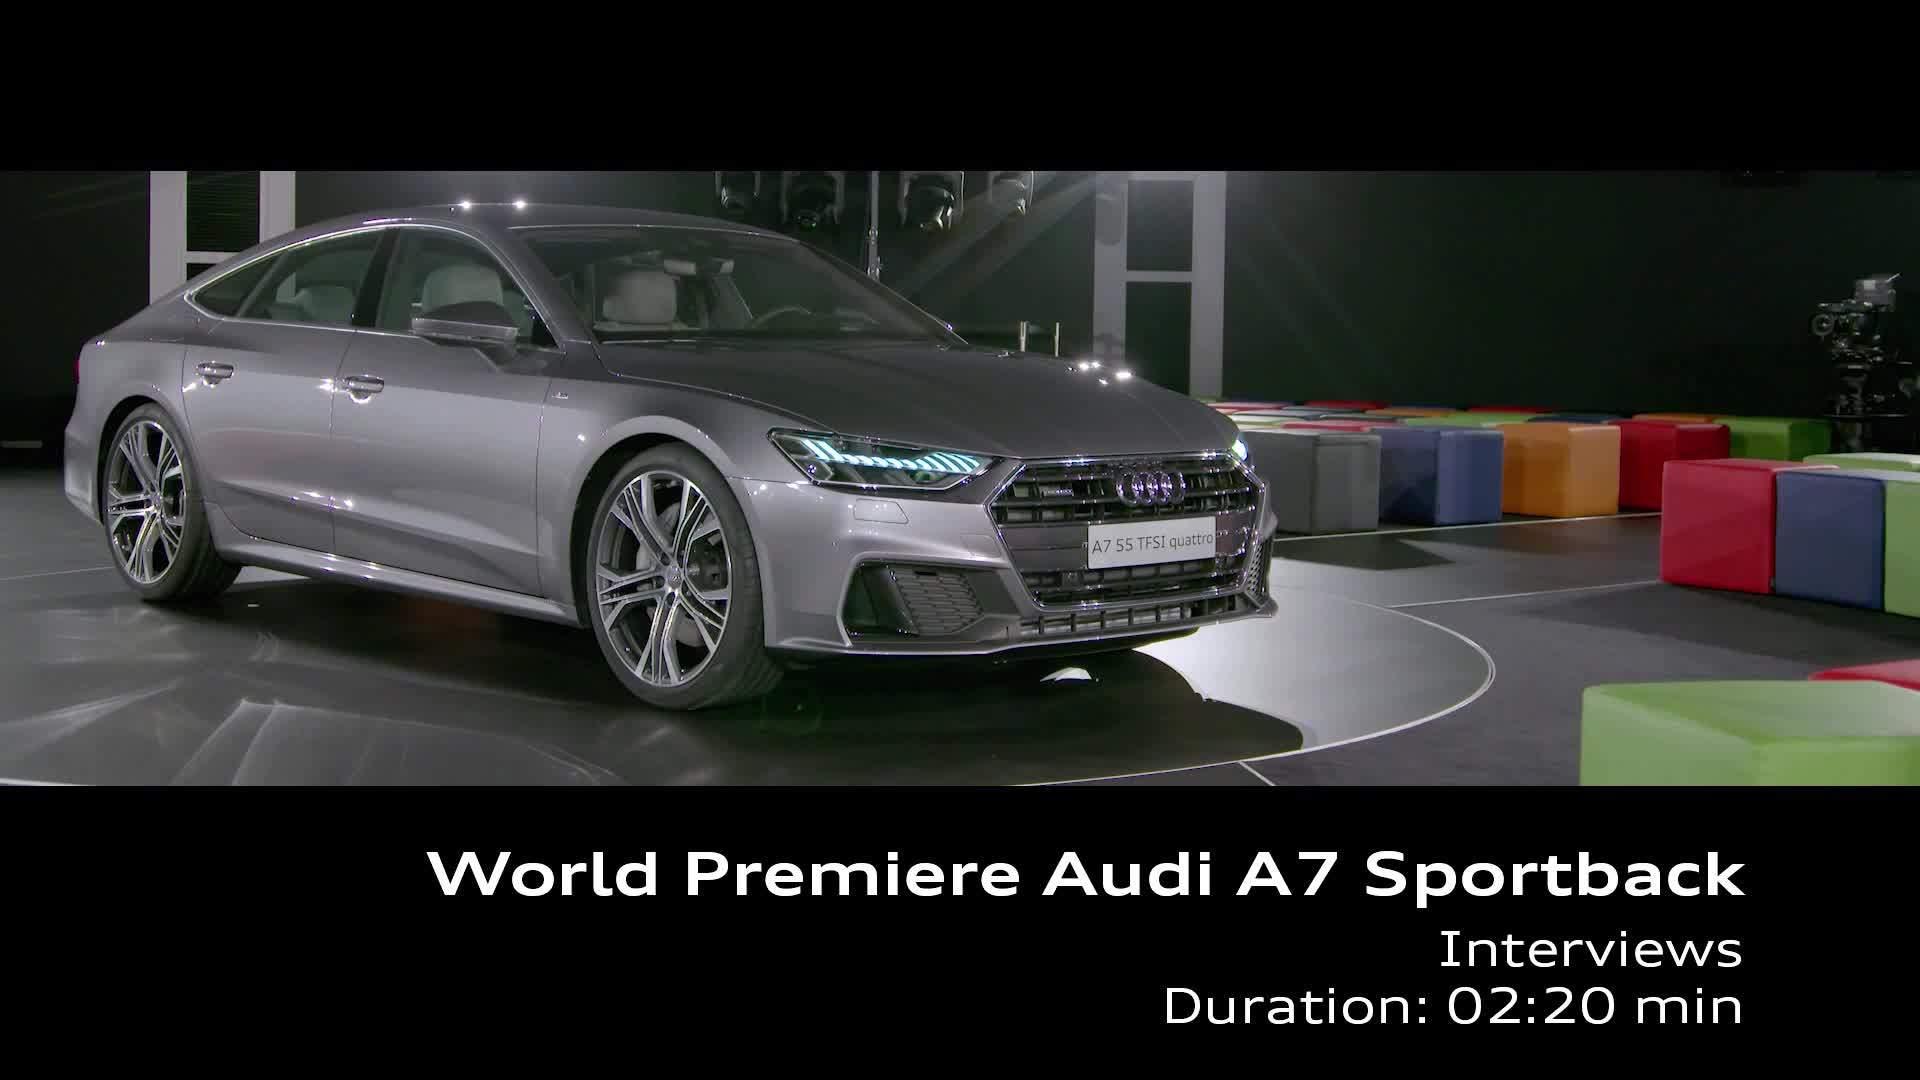 Audi A7 Weltpremiere Interviews Stadler, Mertens, Lichte